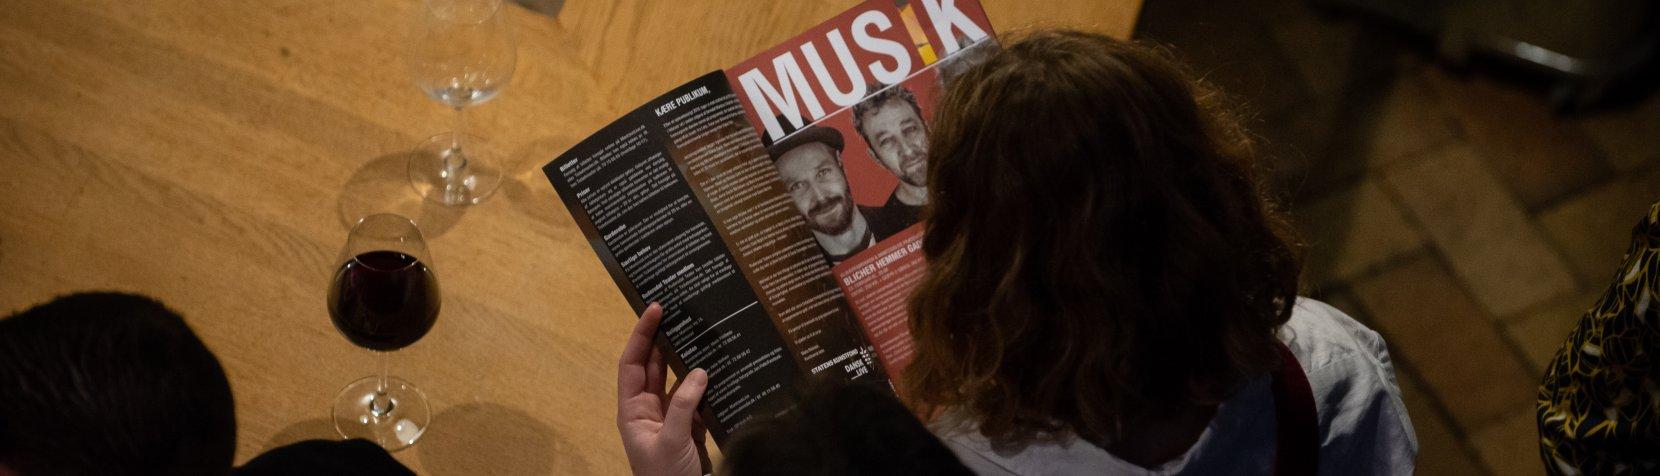 En gæst læser en side med overskriften MUSIK fra MantziusLives trykte program